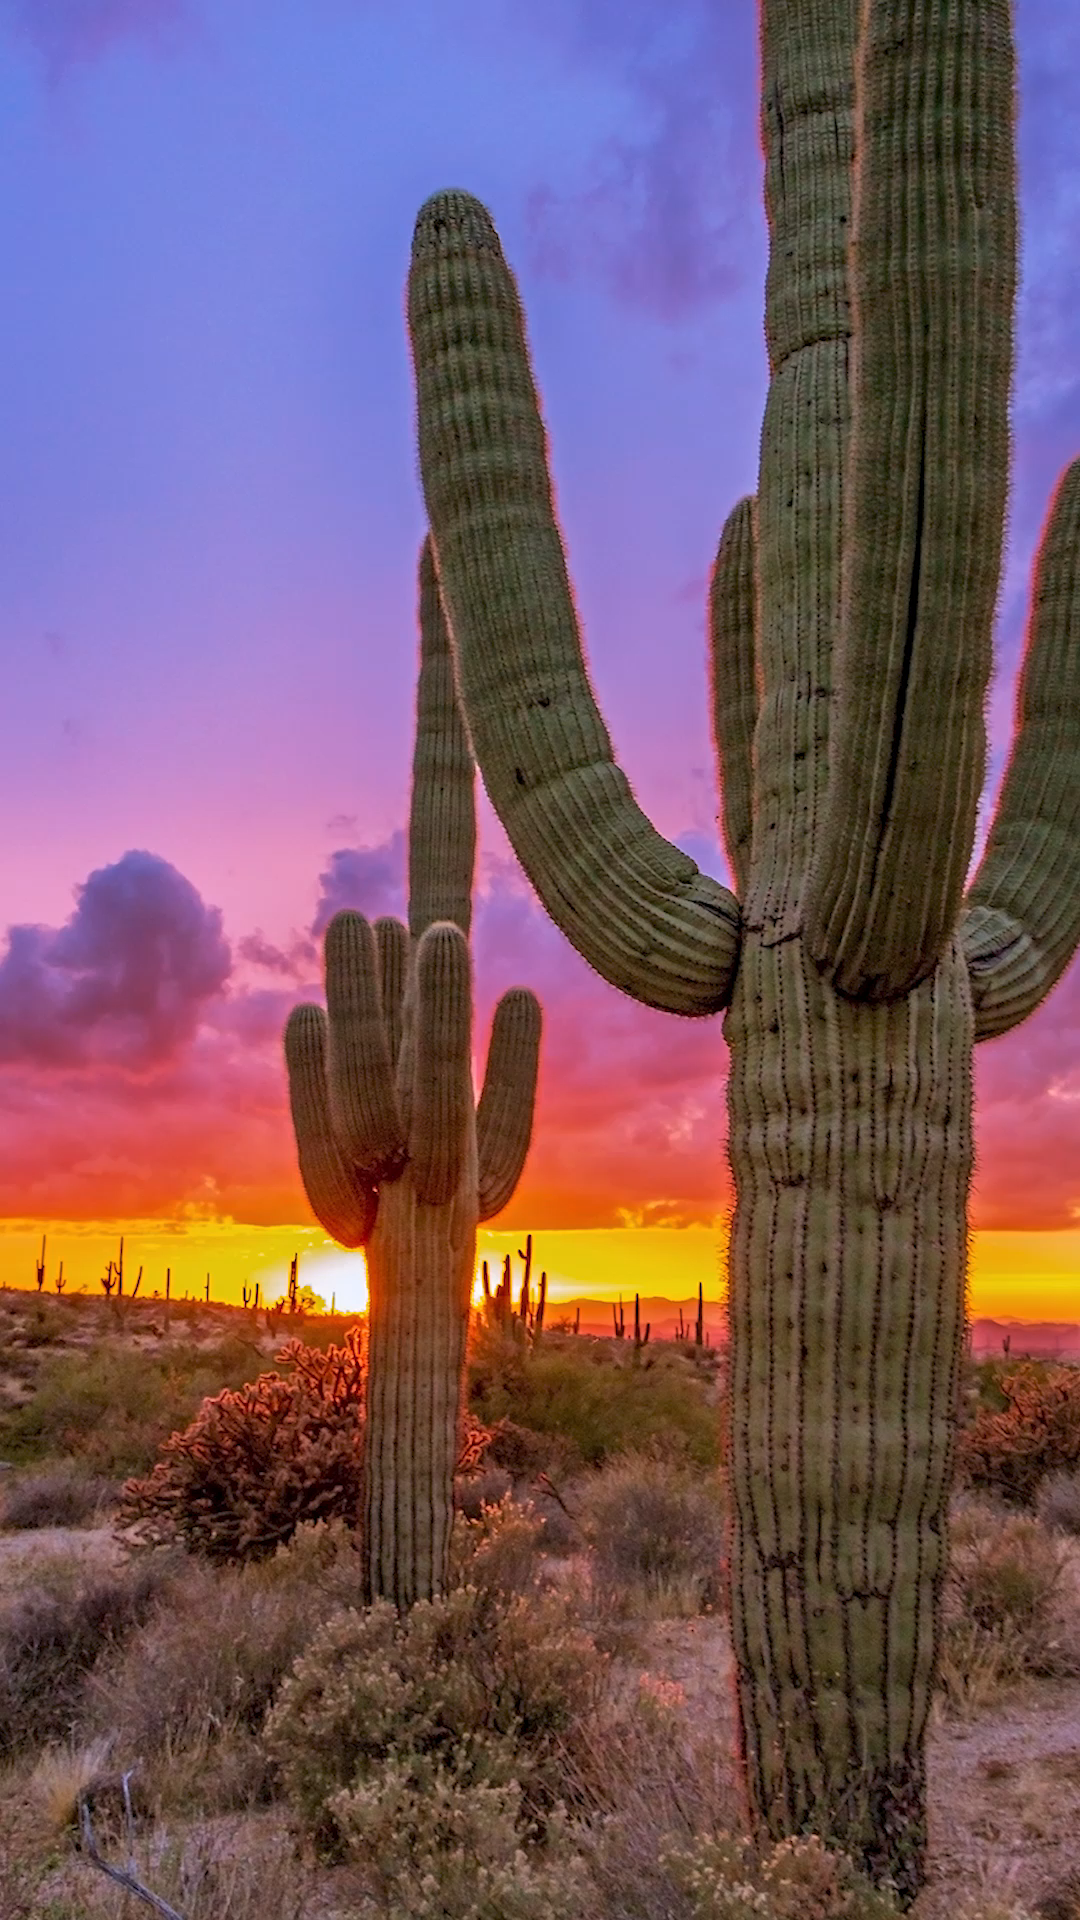 Vibrant Arizona Sunrises & Sunsets